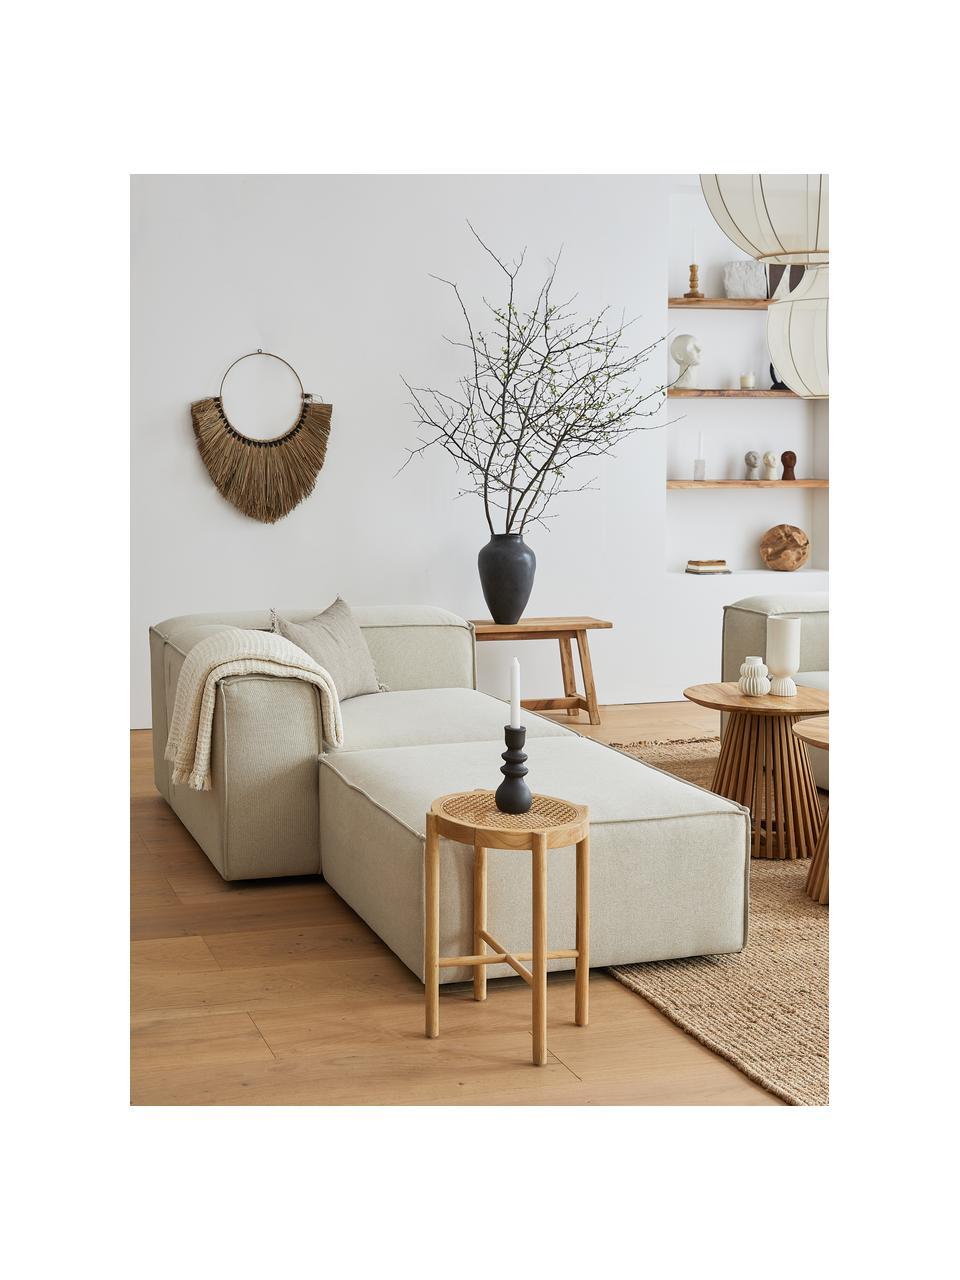 Sofa-Hocker Lennon in Beige, Bezug: Polyester Der hochwertige, Gestell: Massives Kiefernholz, Spe, Webstoff Beige, 88 x 43 cm